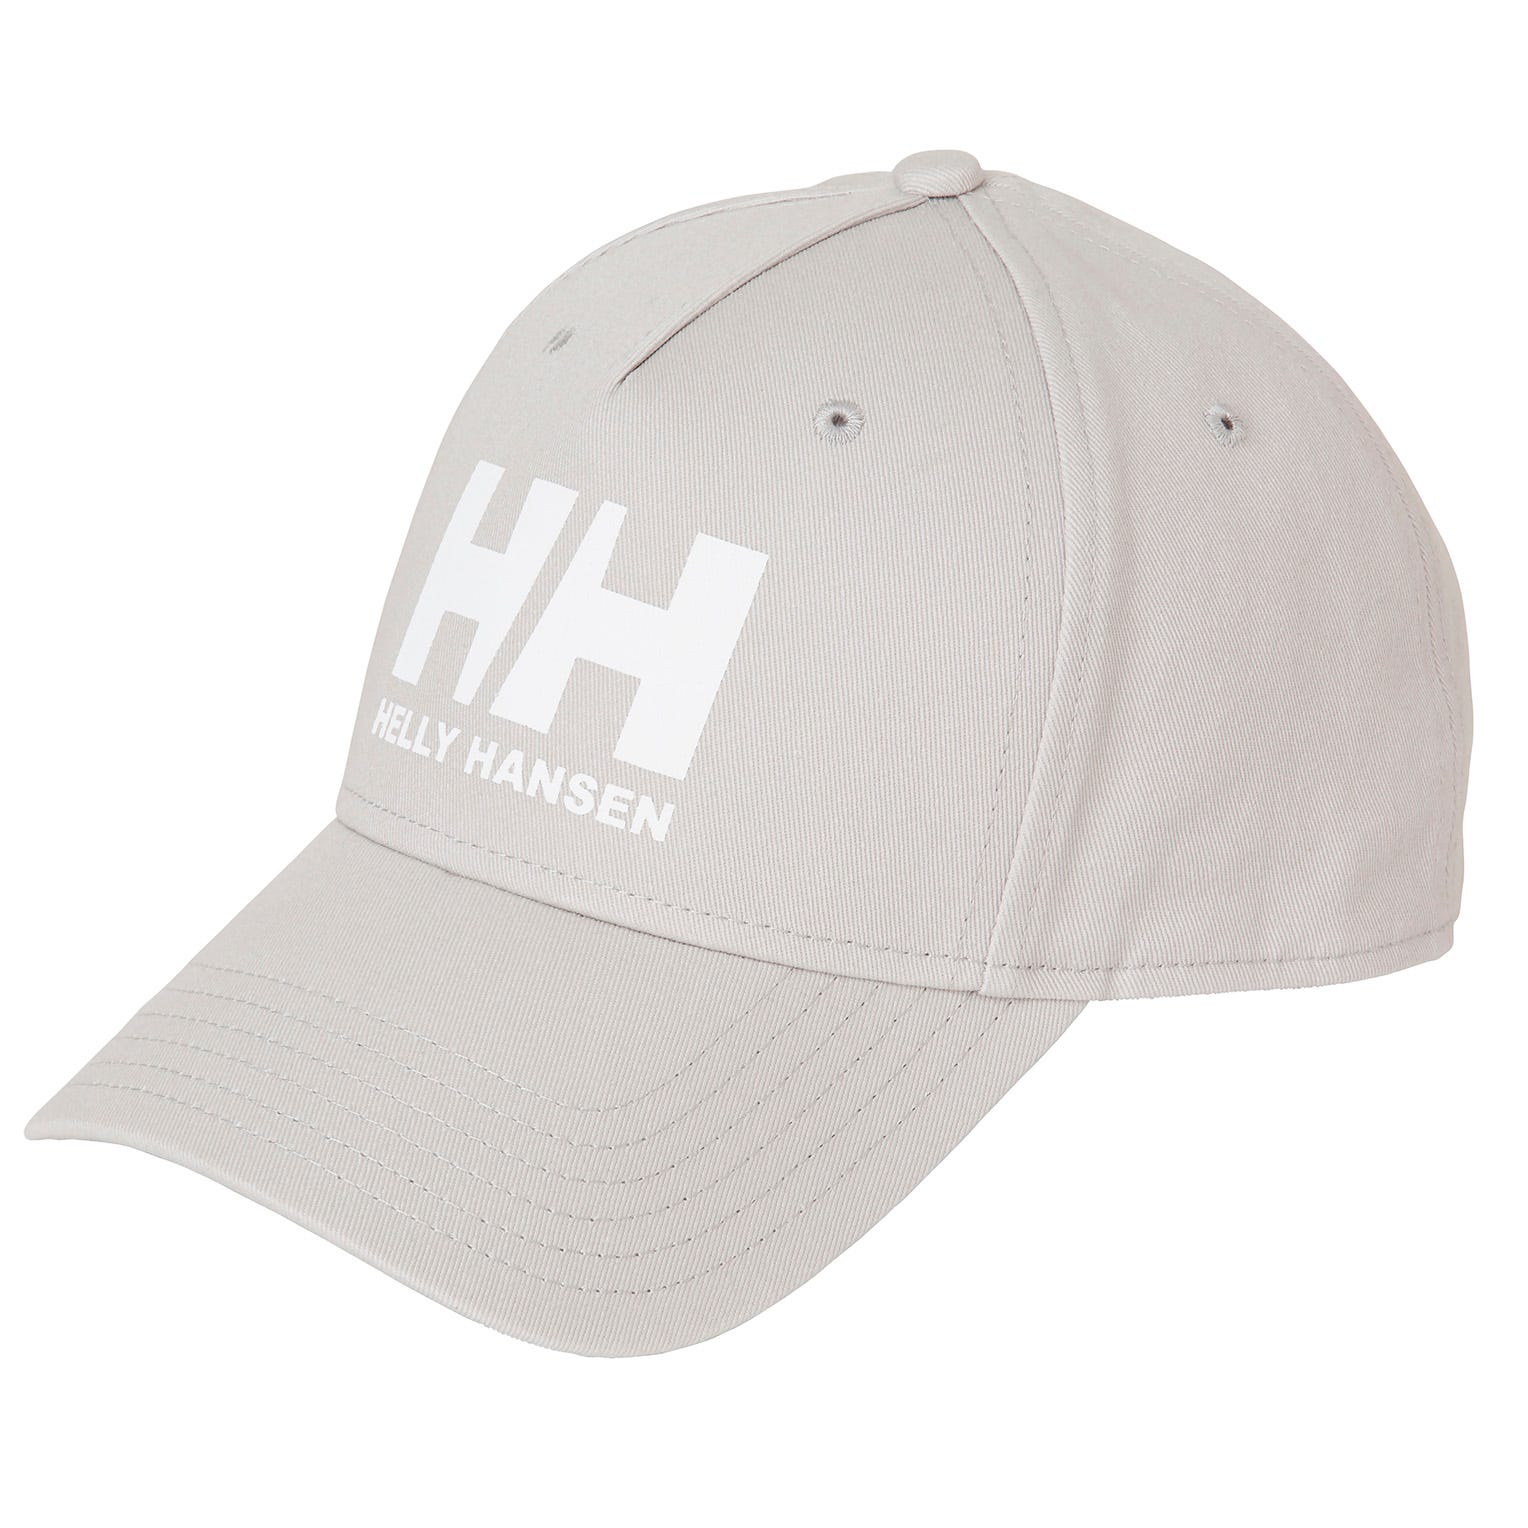 HH Helly Hansen Ball Cap  67434 navy Snapback Cap Brand Logo Cap Baseballcap